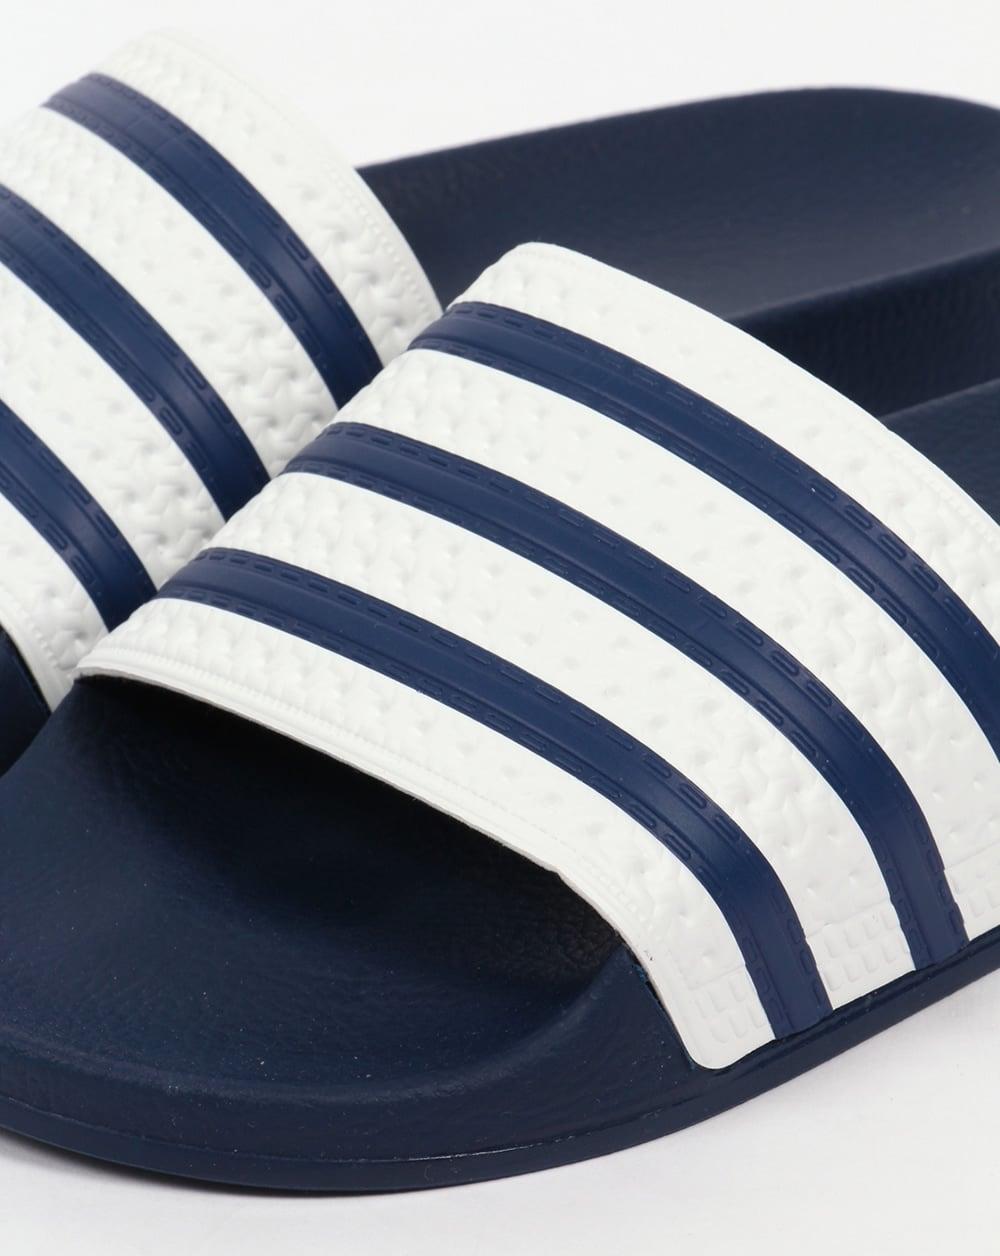 Adidas Adilette Sliders White Navy 04c255abe7f8